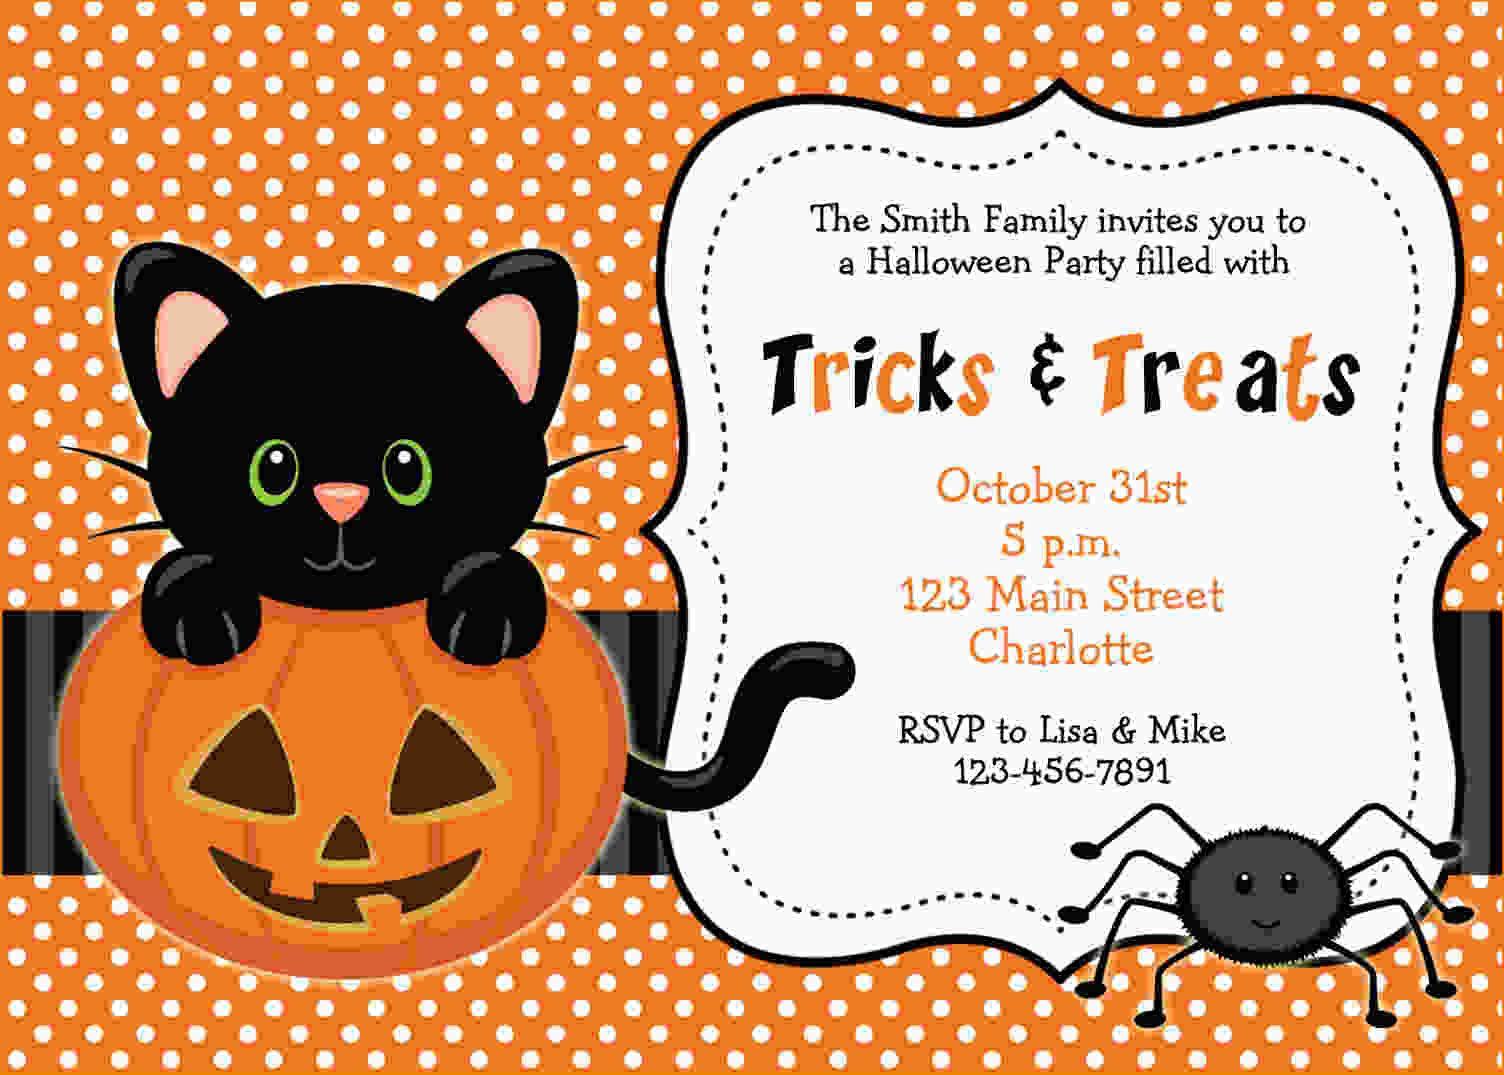 Free Printable Halloween Invitations | Free Printable Birthday - Free Printable Halloween Party Invitations